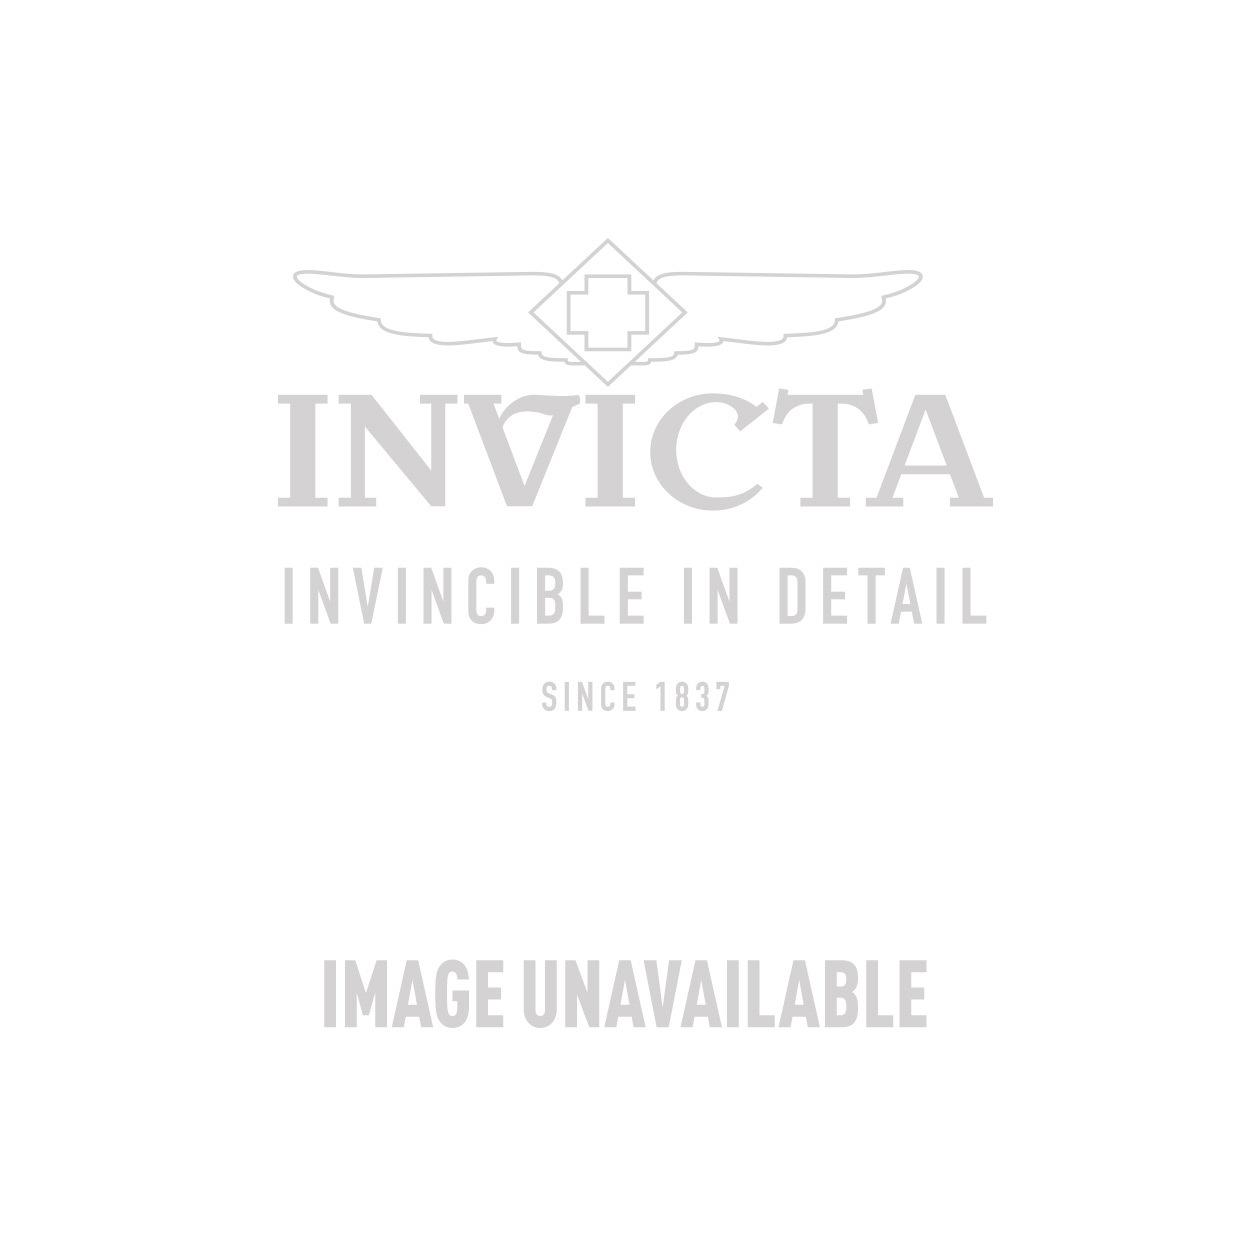 Invicta Pro Diver Men's Quartz 40mm Gold, Stainless Steel Case Blue Dial - Model 9310